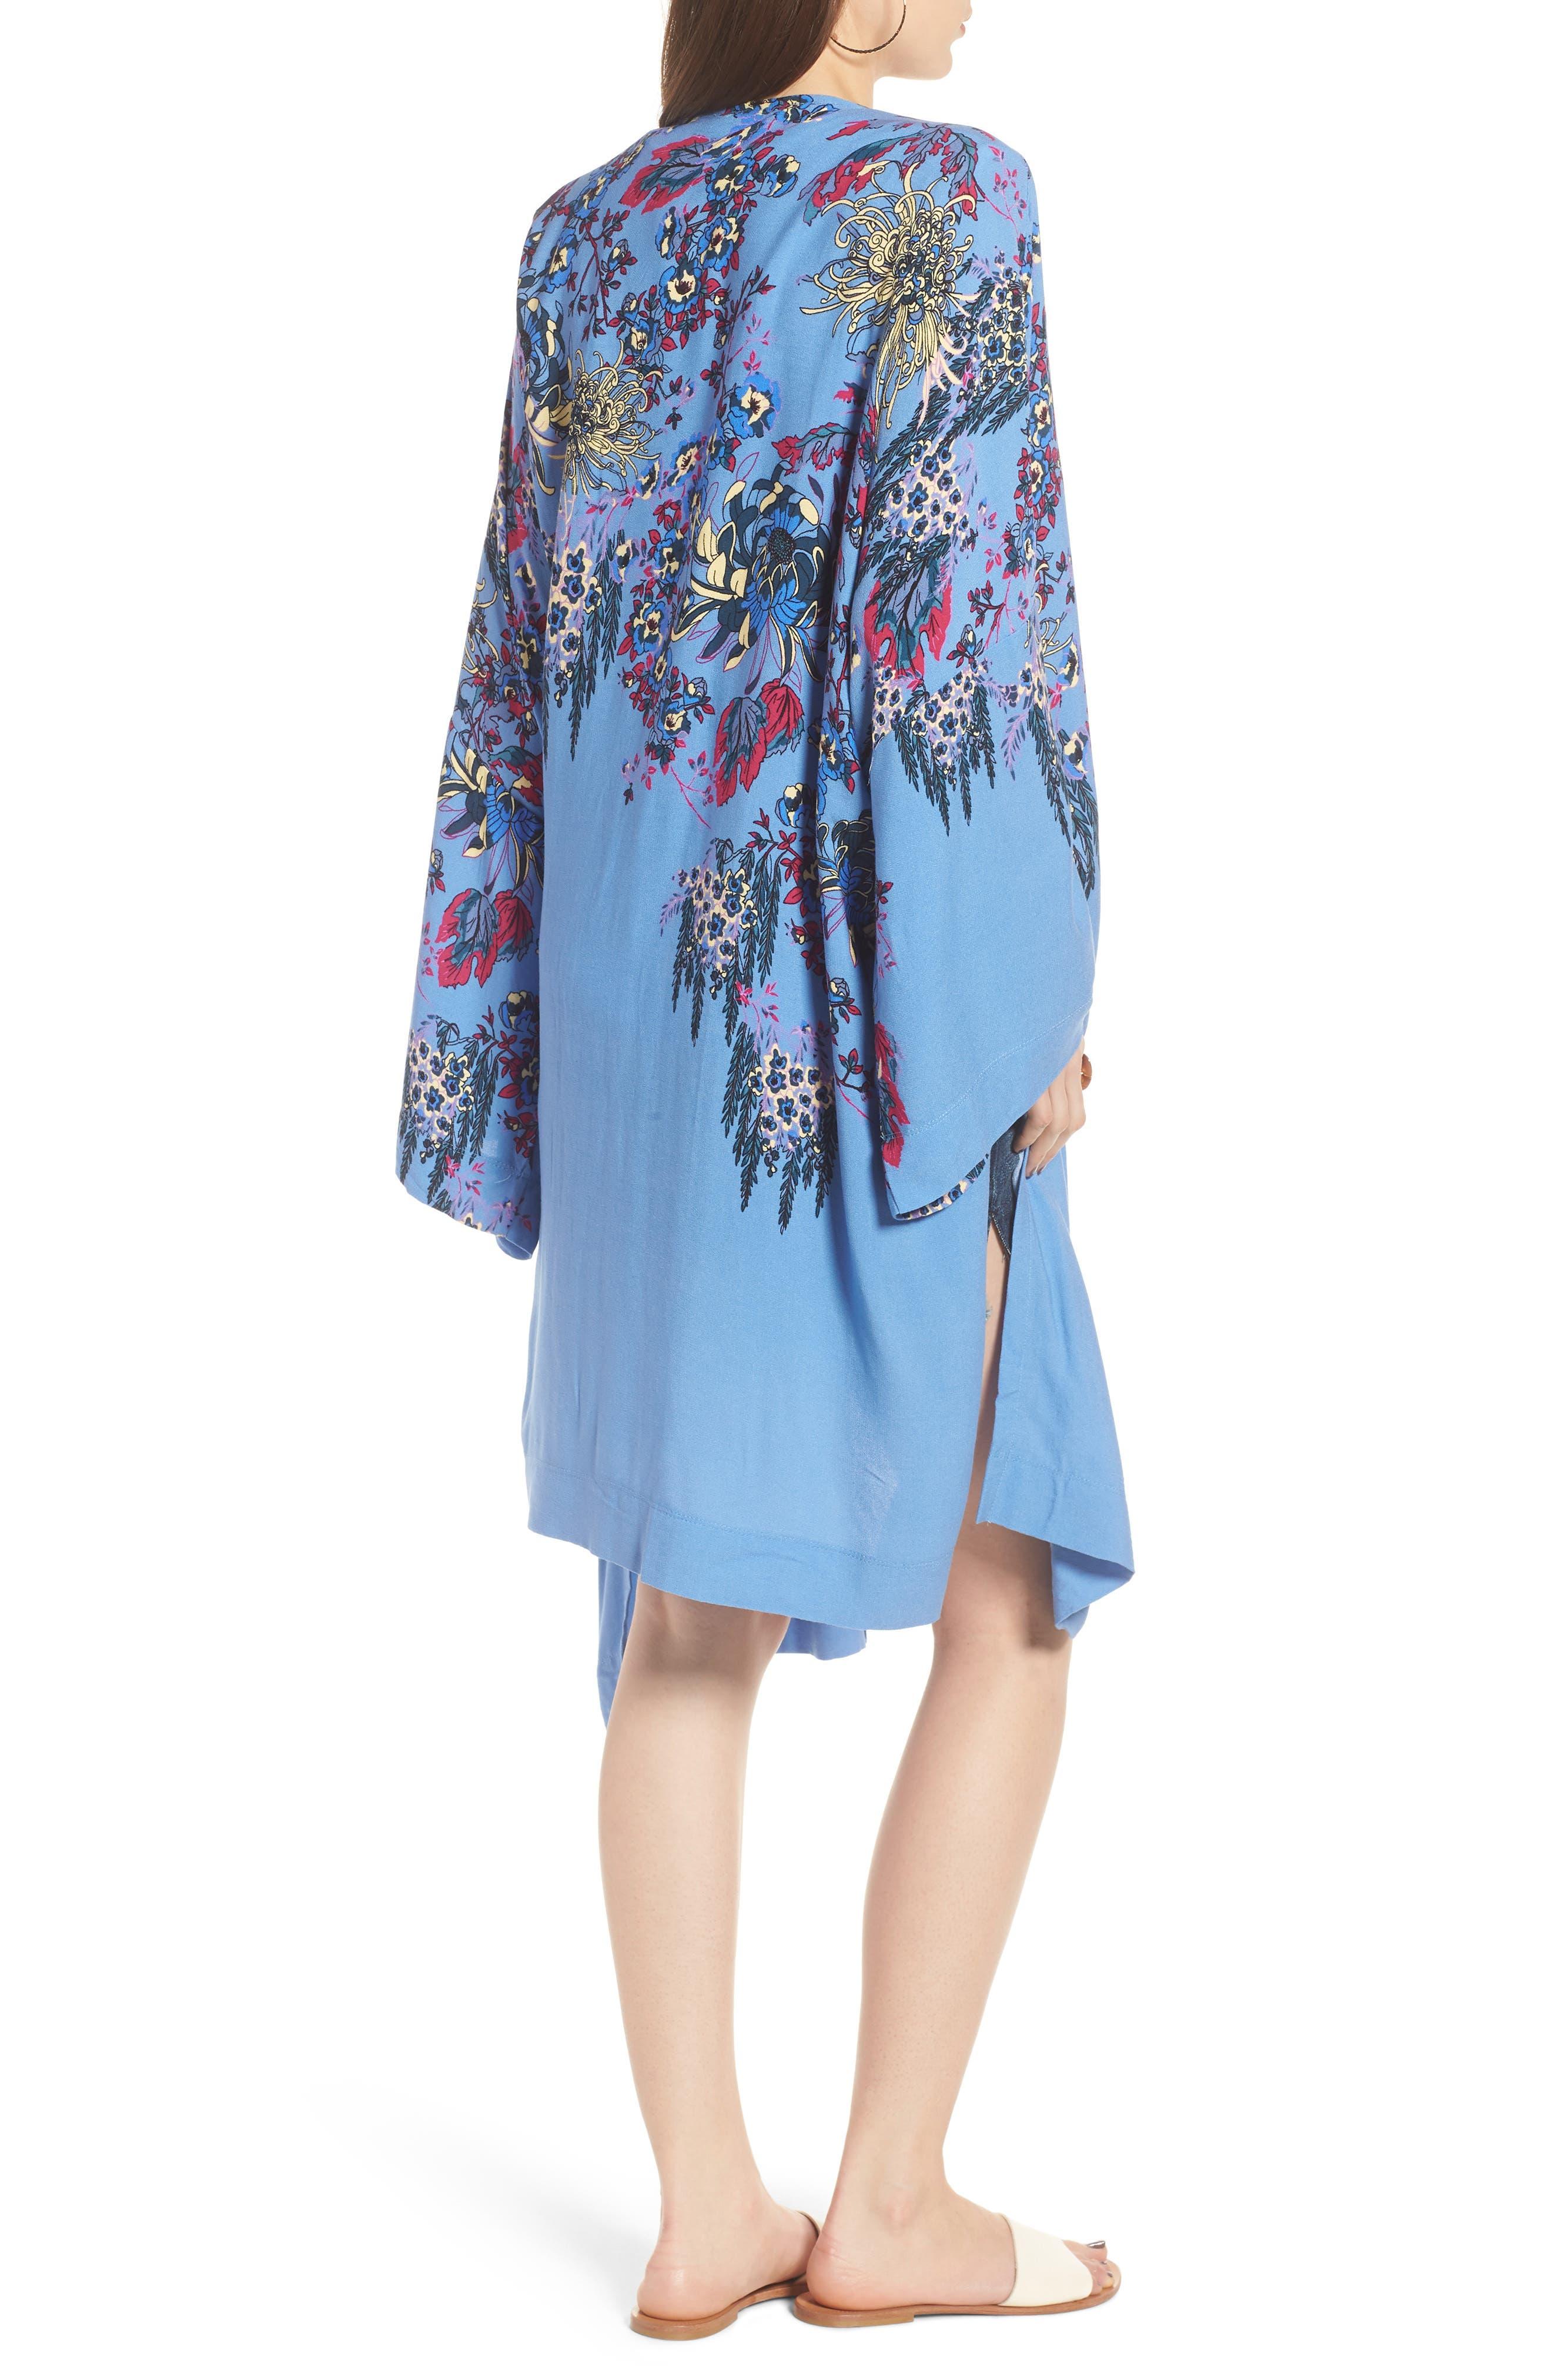 FREE PEOPLE, Dont Know Kimono, Alternate thumbnail 2, color, BLUE COMBO